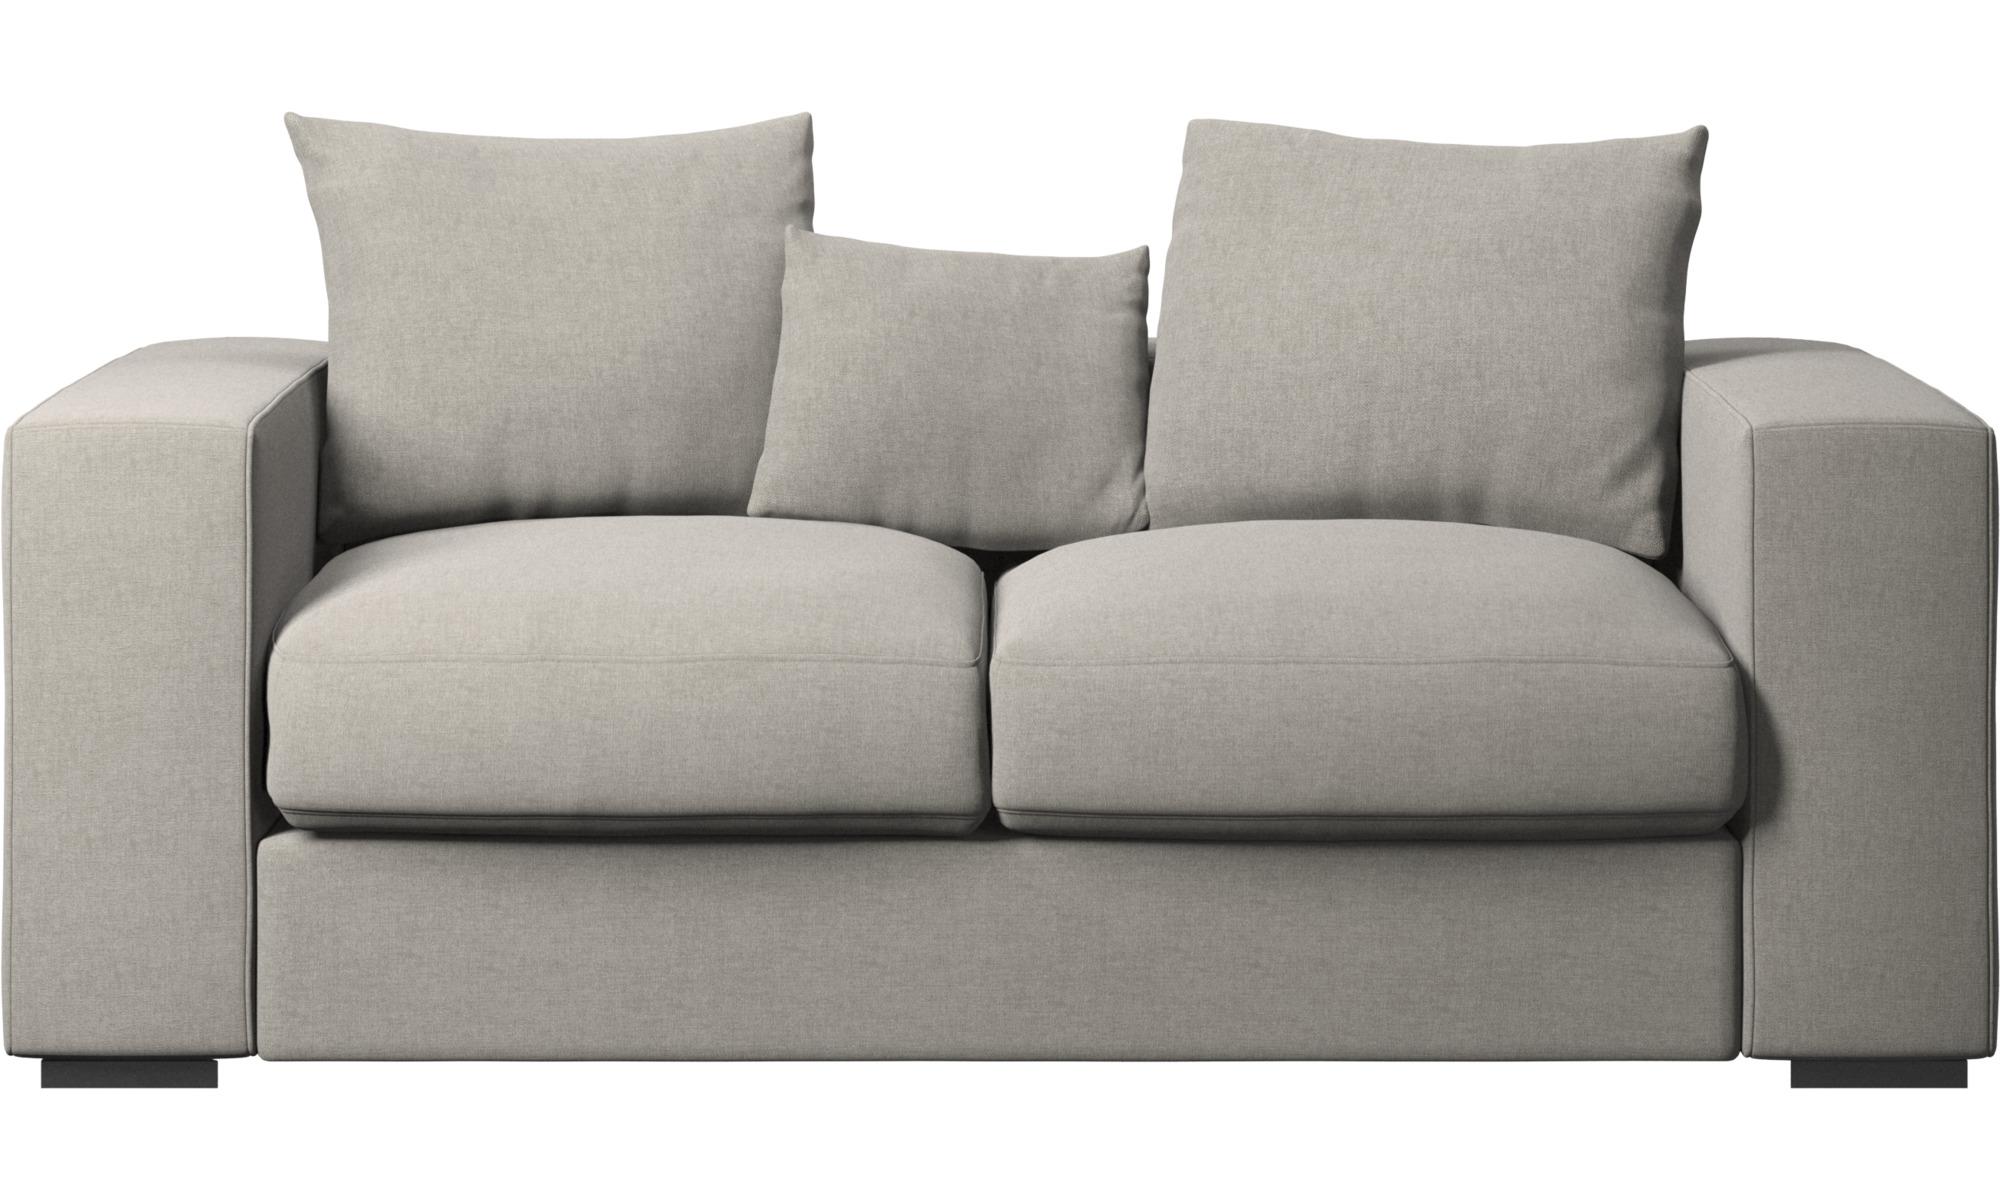 2 seater sofas - Cenova sofa - BoConcept